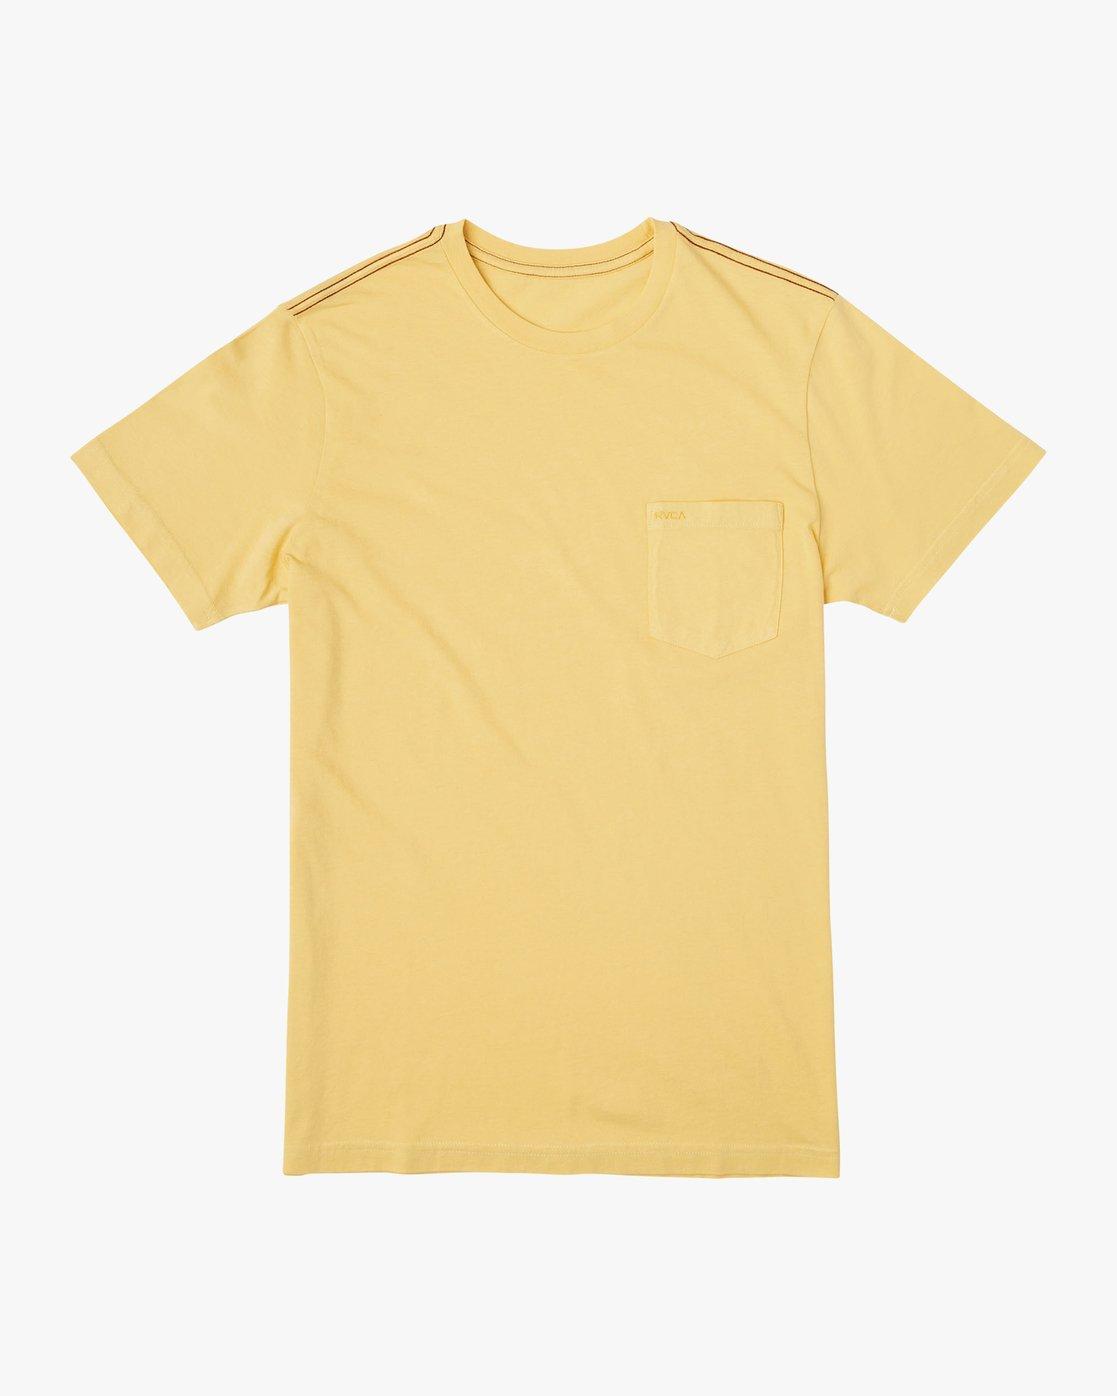 0 PTC 2 Pigment T-Shirt Yellow M437VRPT RVCA